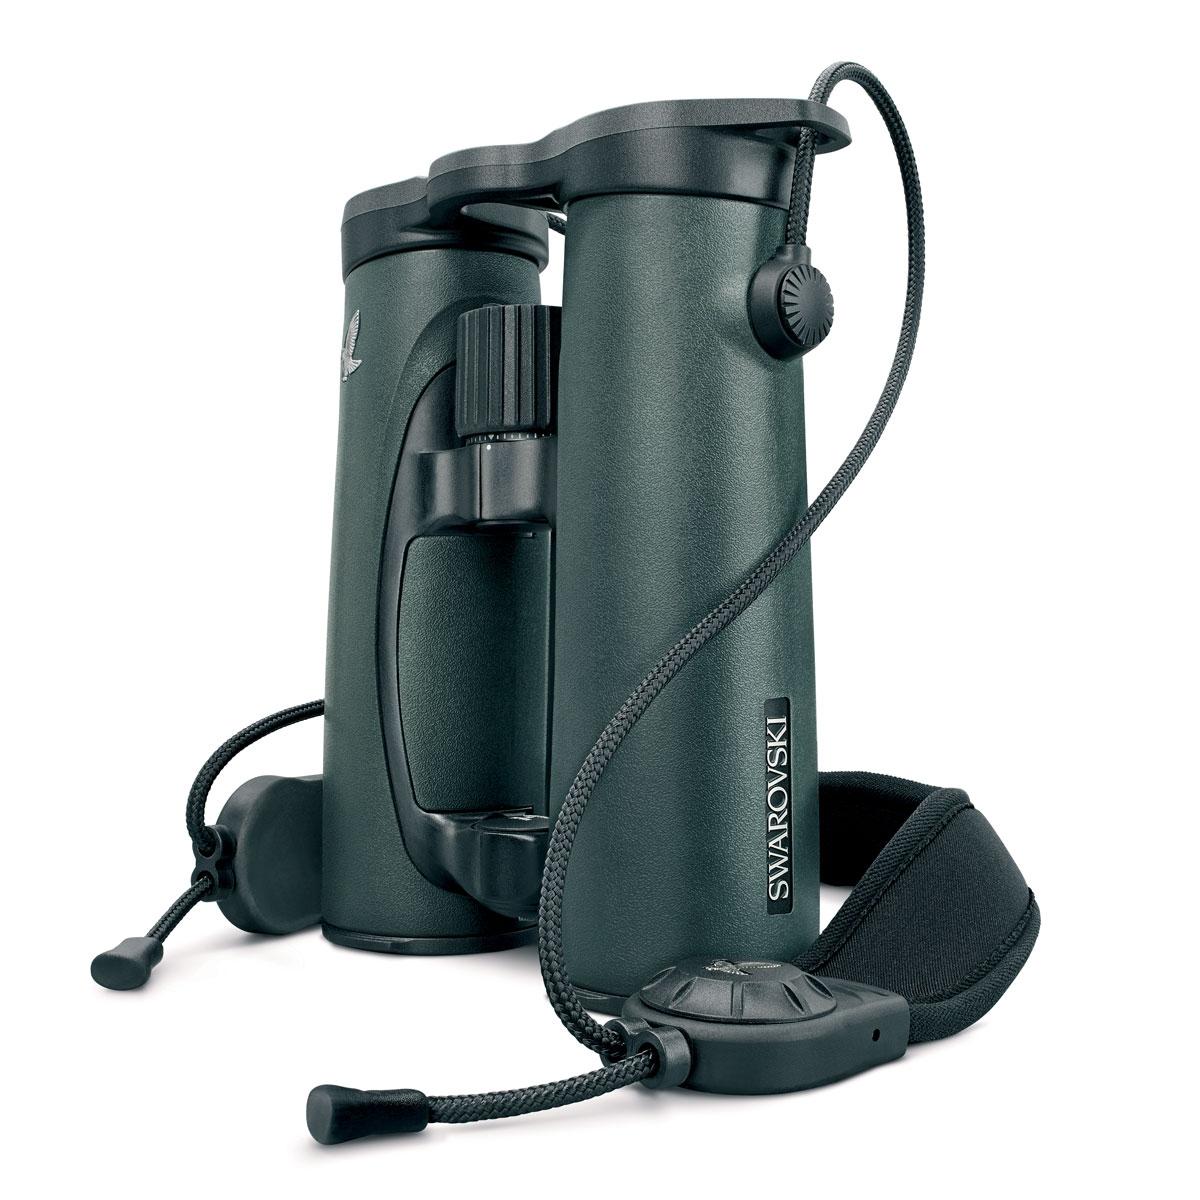 Swarovski Ccsp Comfort Carrying Strap Pro For Field Pro Binoculars Novel In Design;